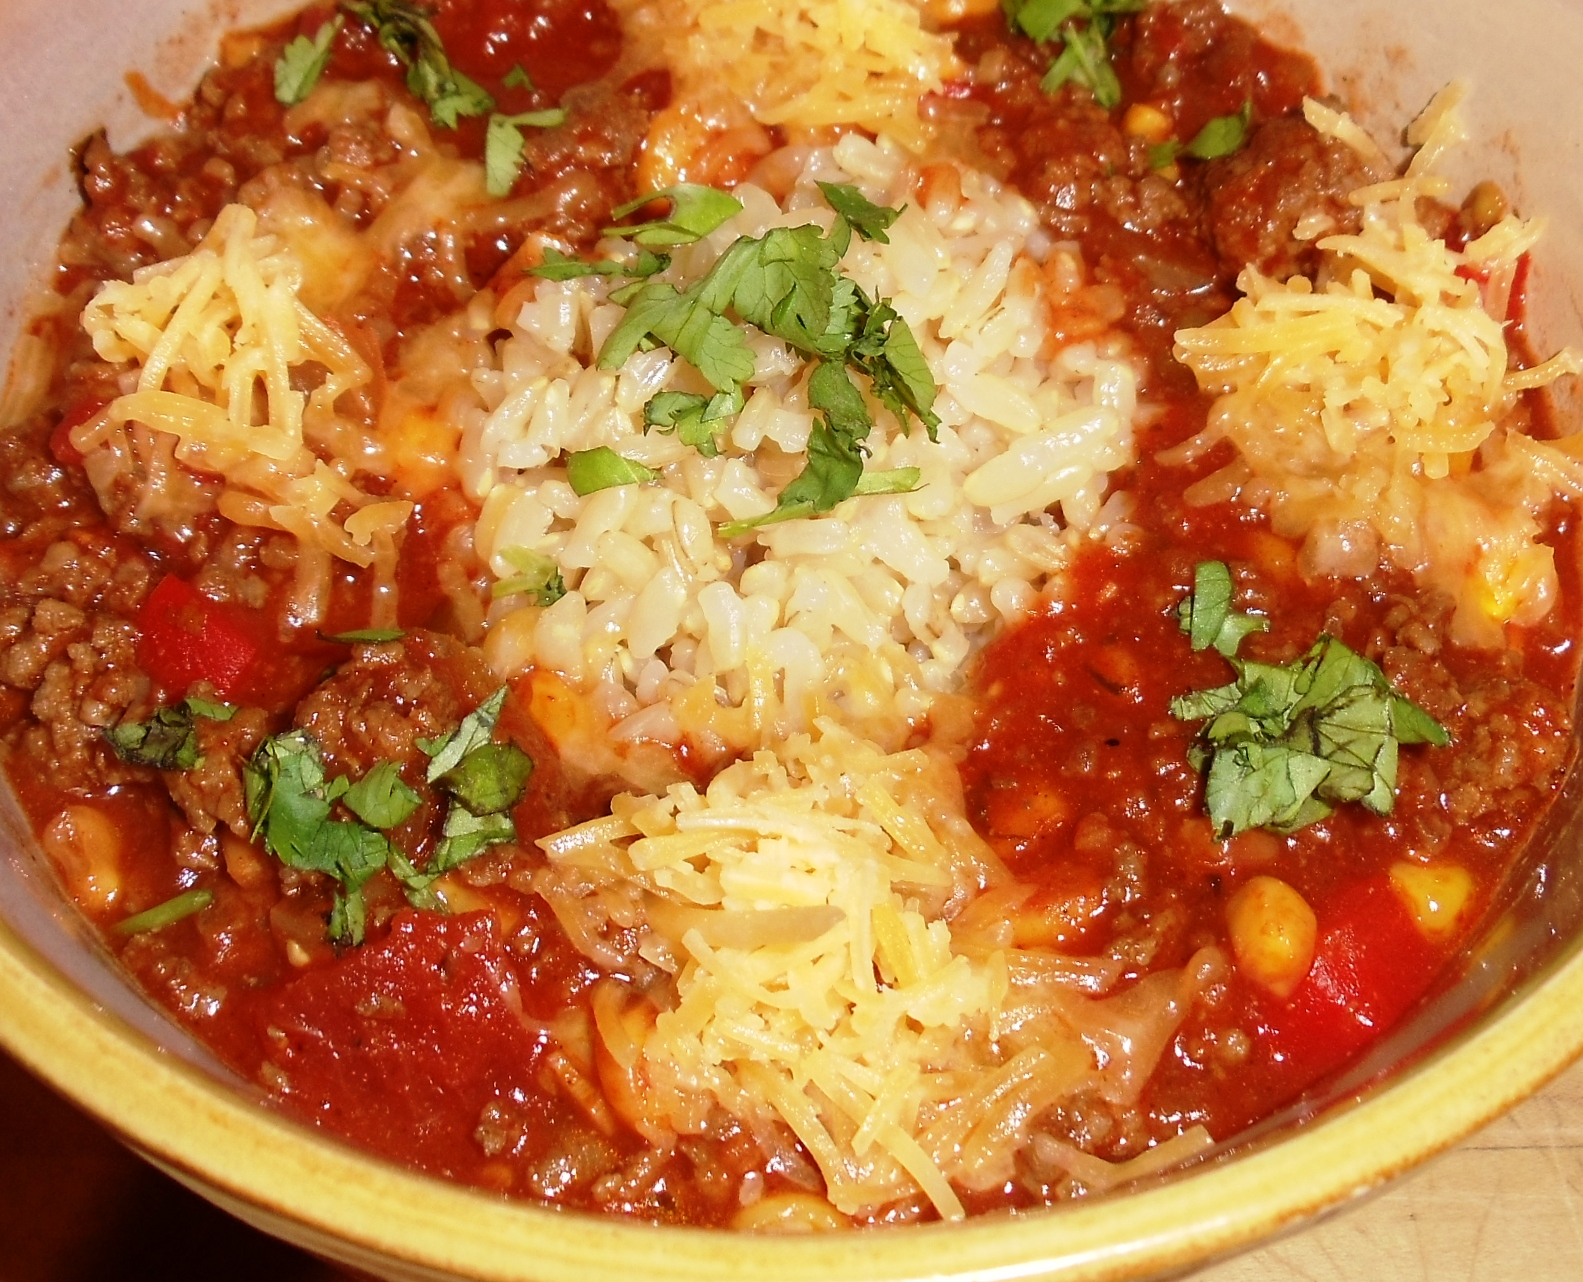 Sandra's Alaska Recipes: SANDRA'S FEISTY FIESTA MEXICAN RICE BOWL